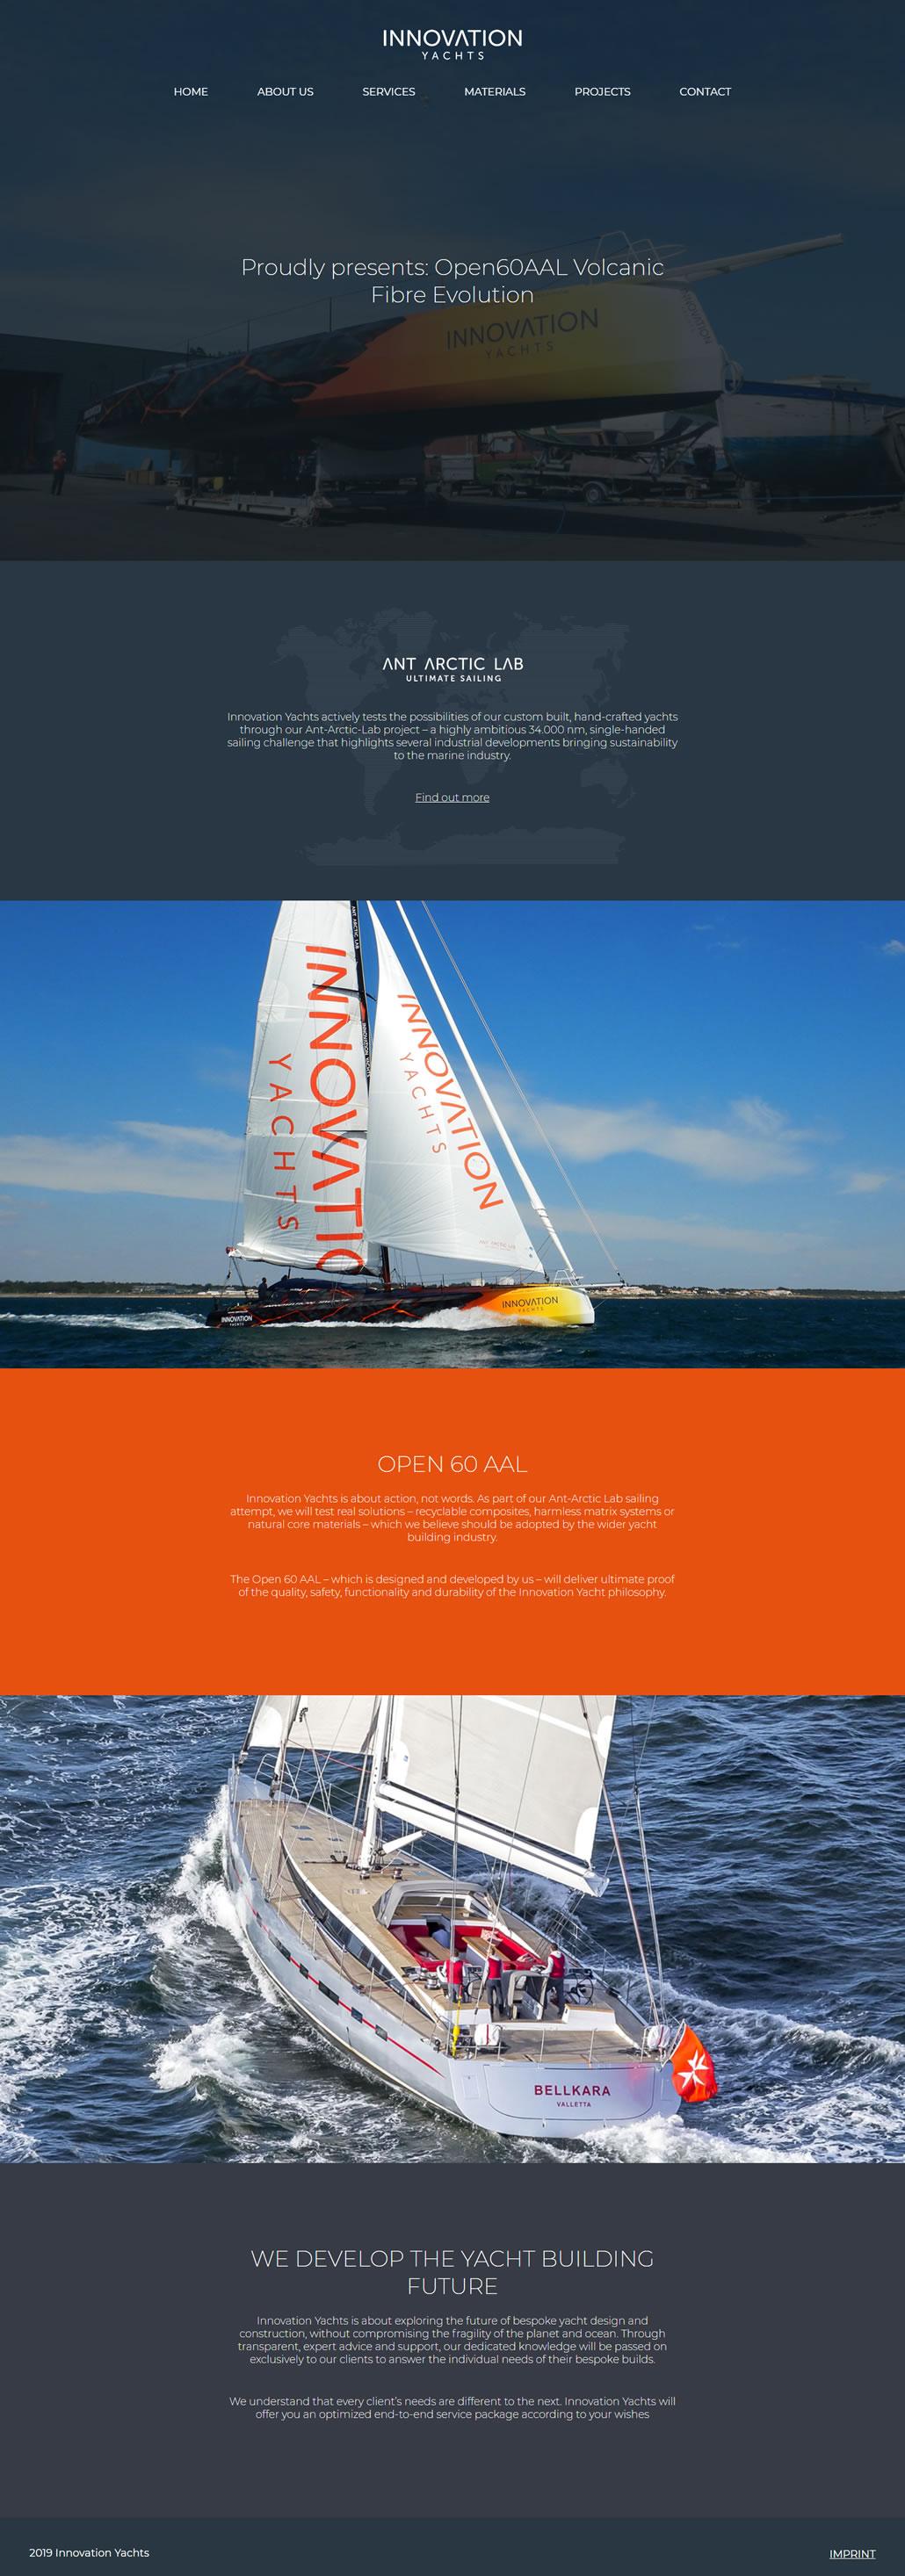 Innovation Yachts built using WordPress, web design by Convoy Media